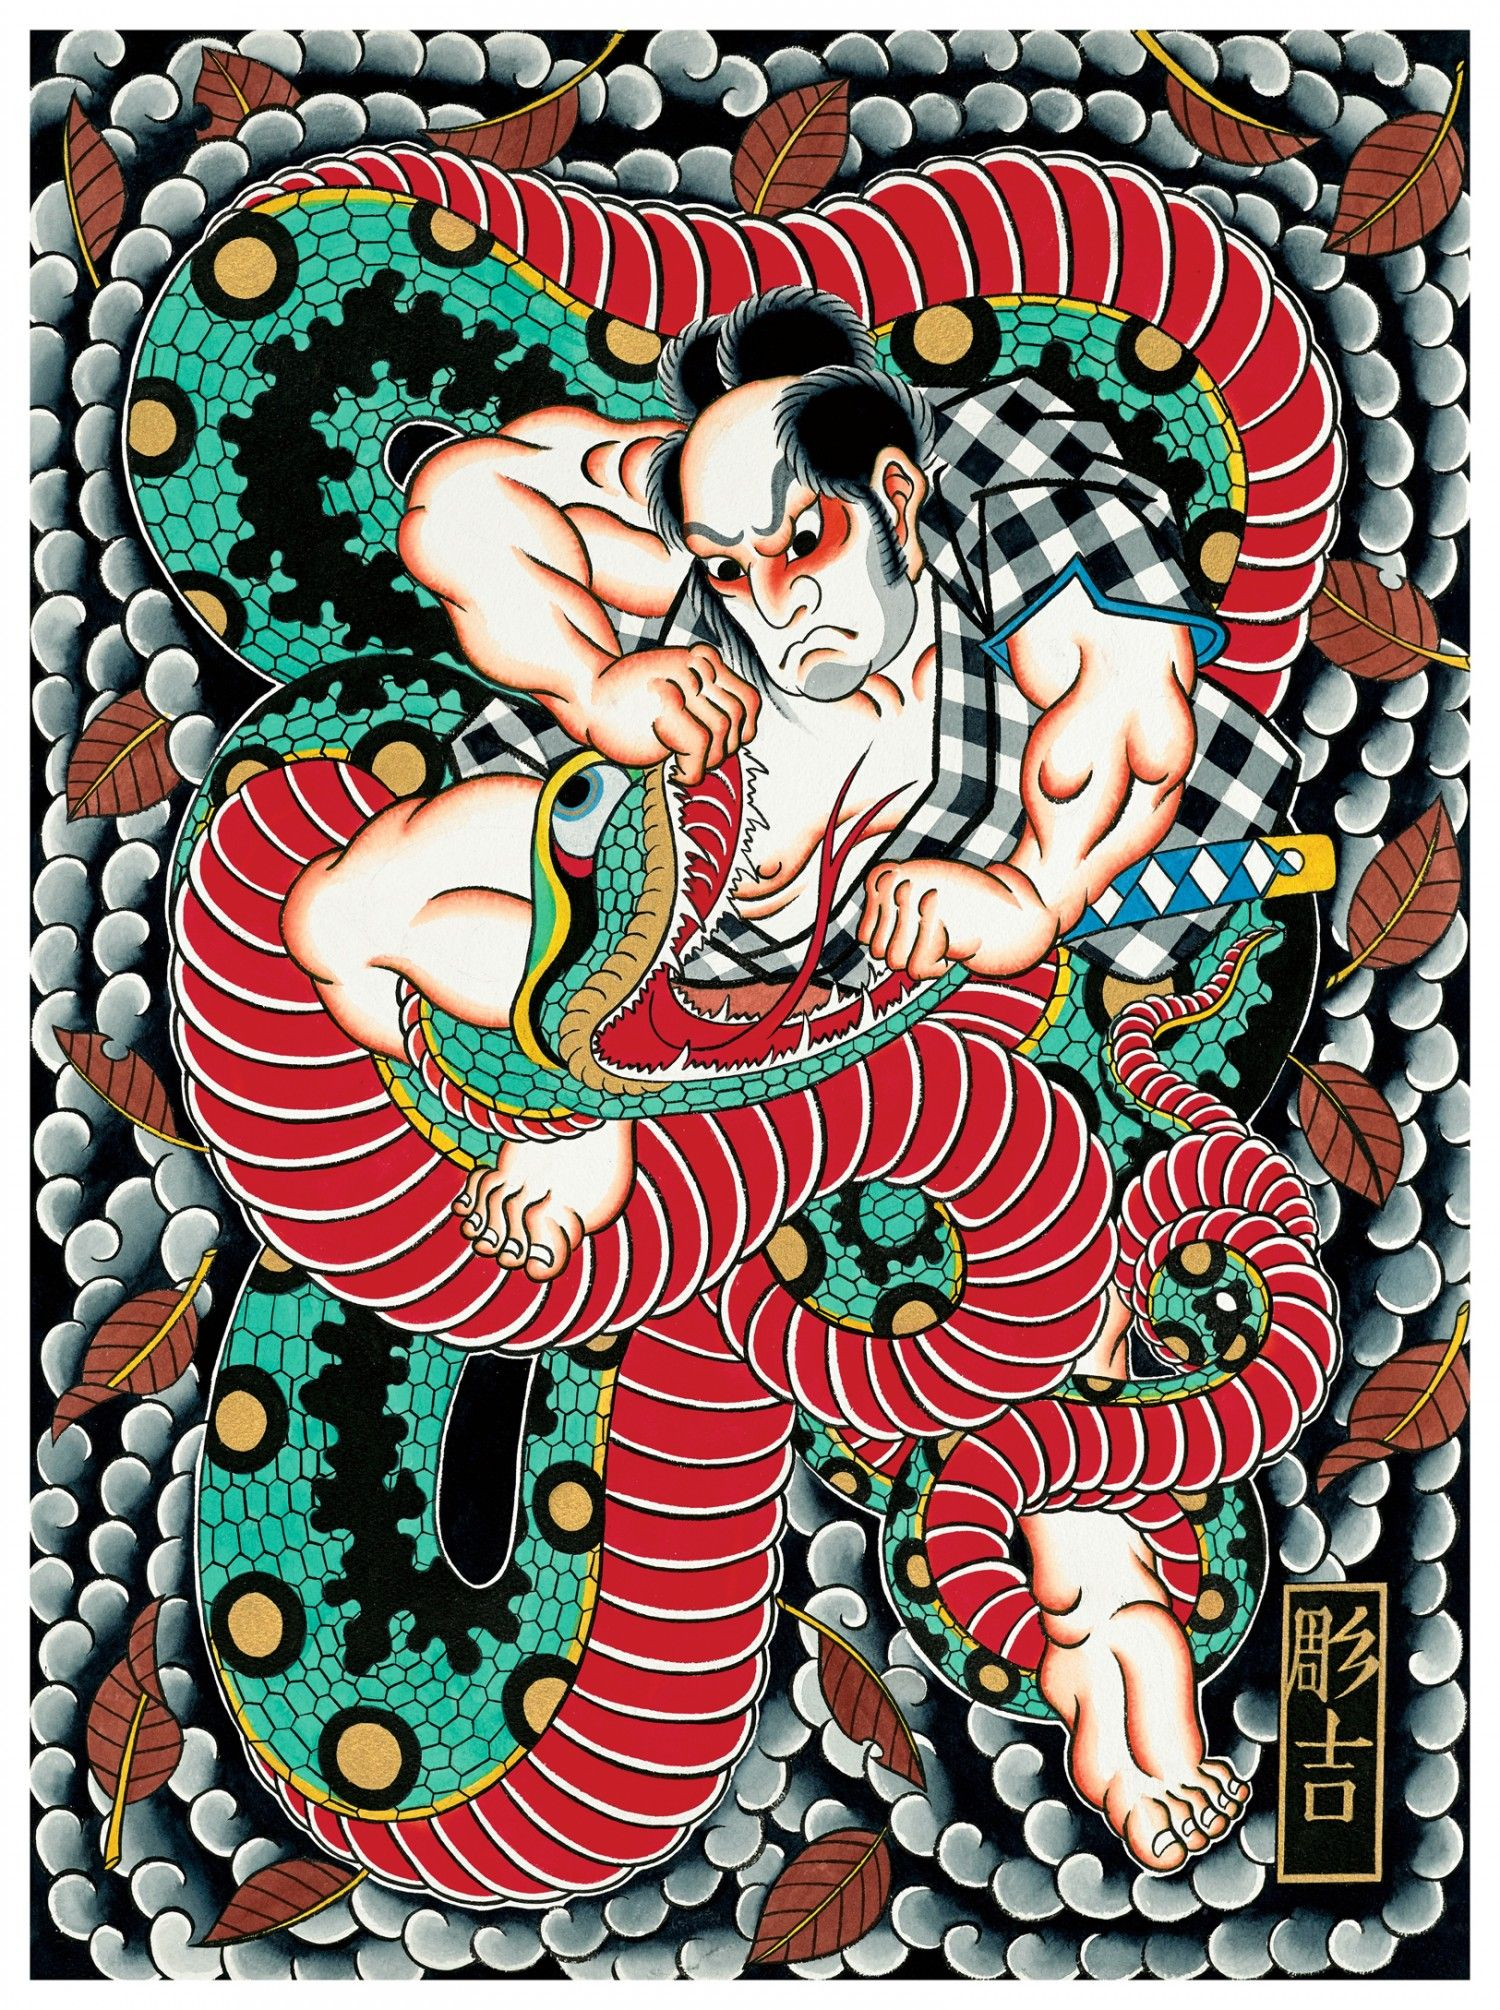 Saginoike Heikuro